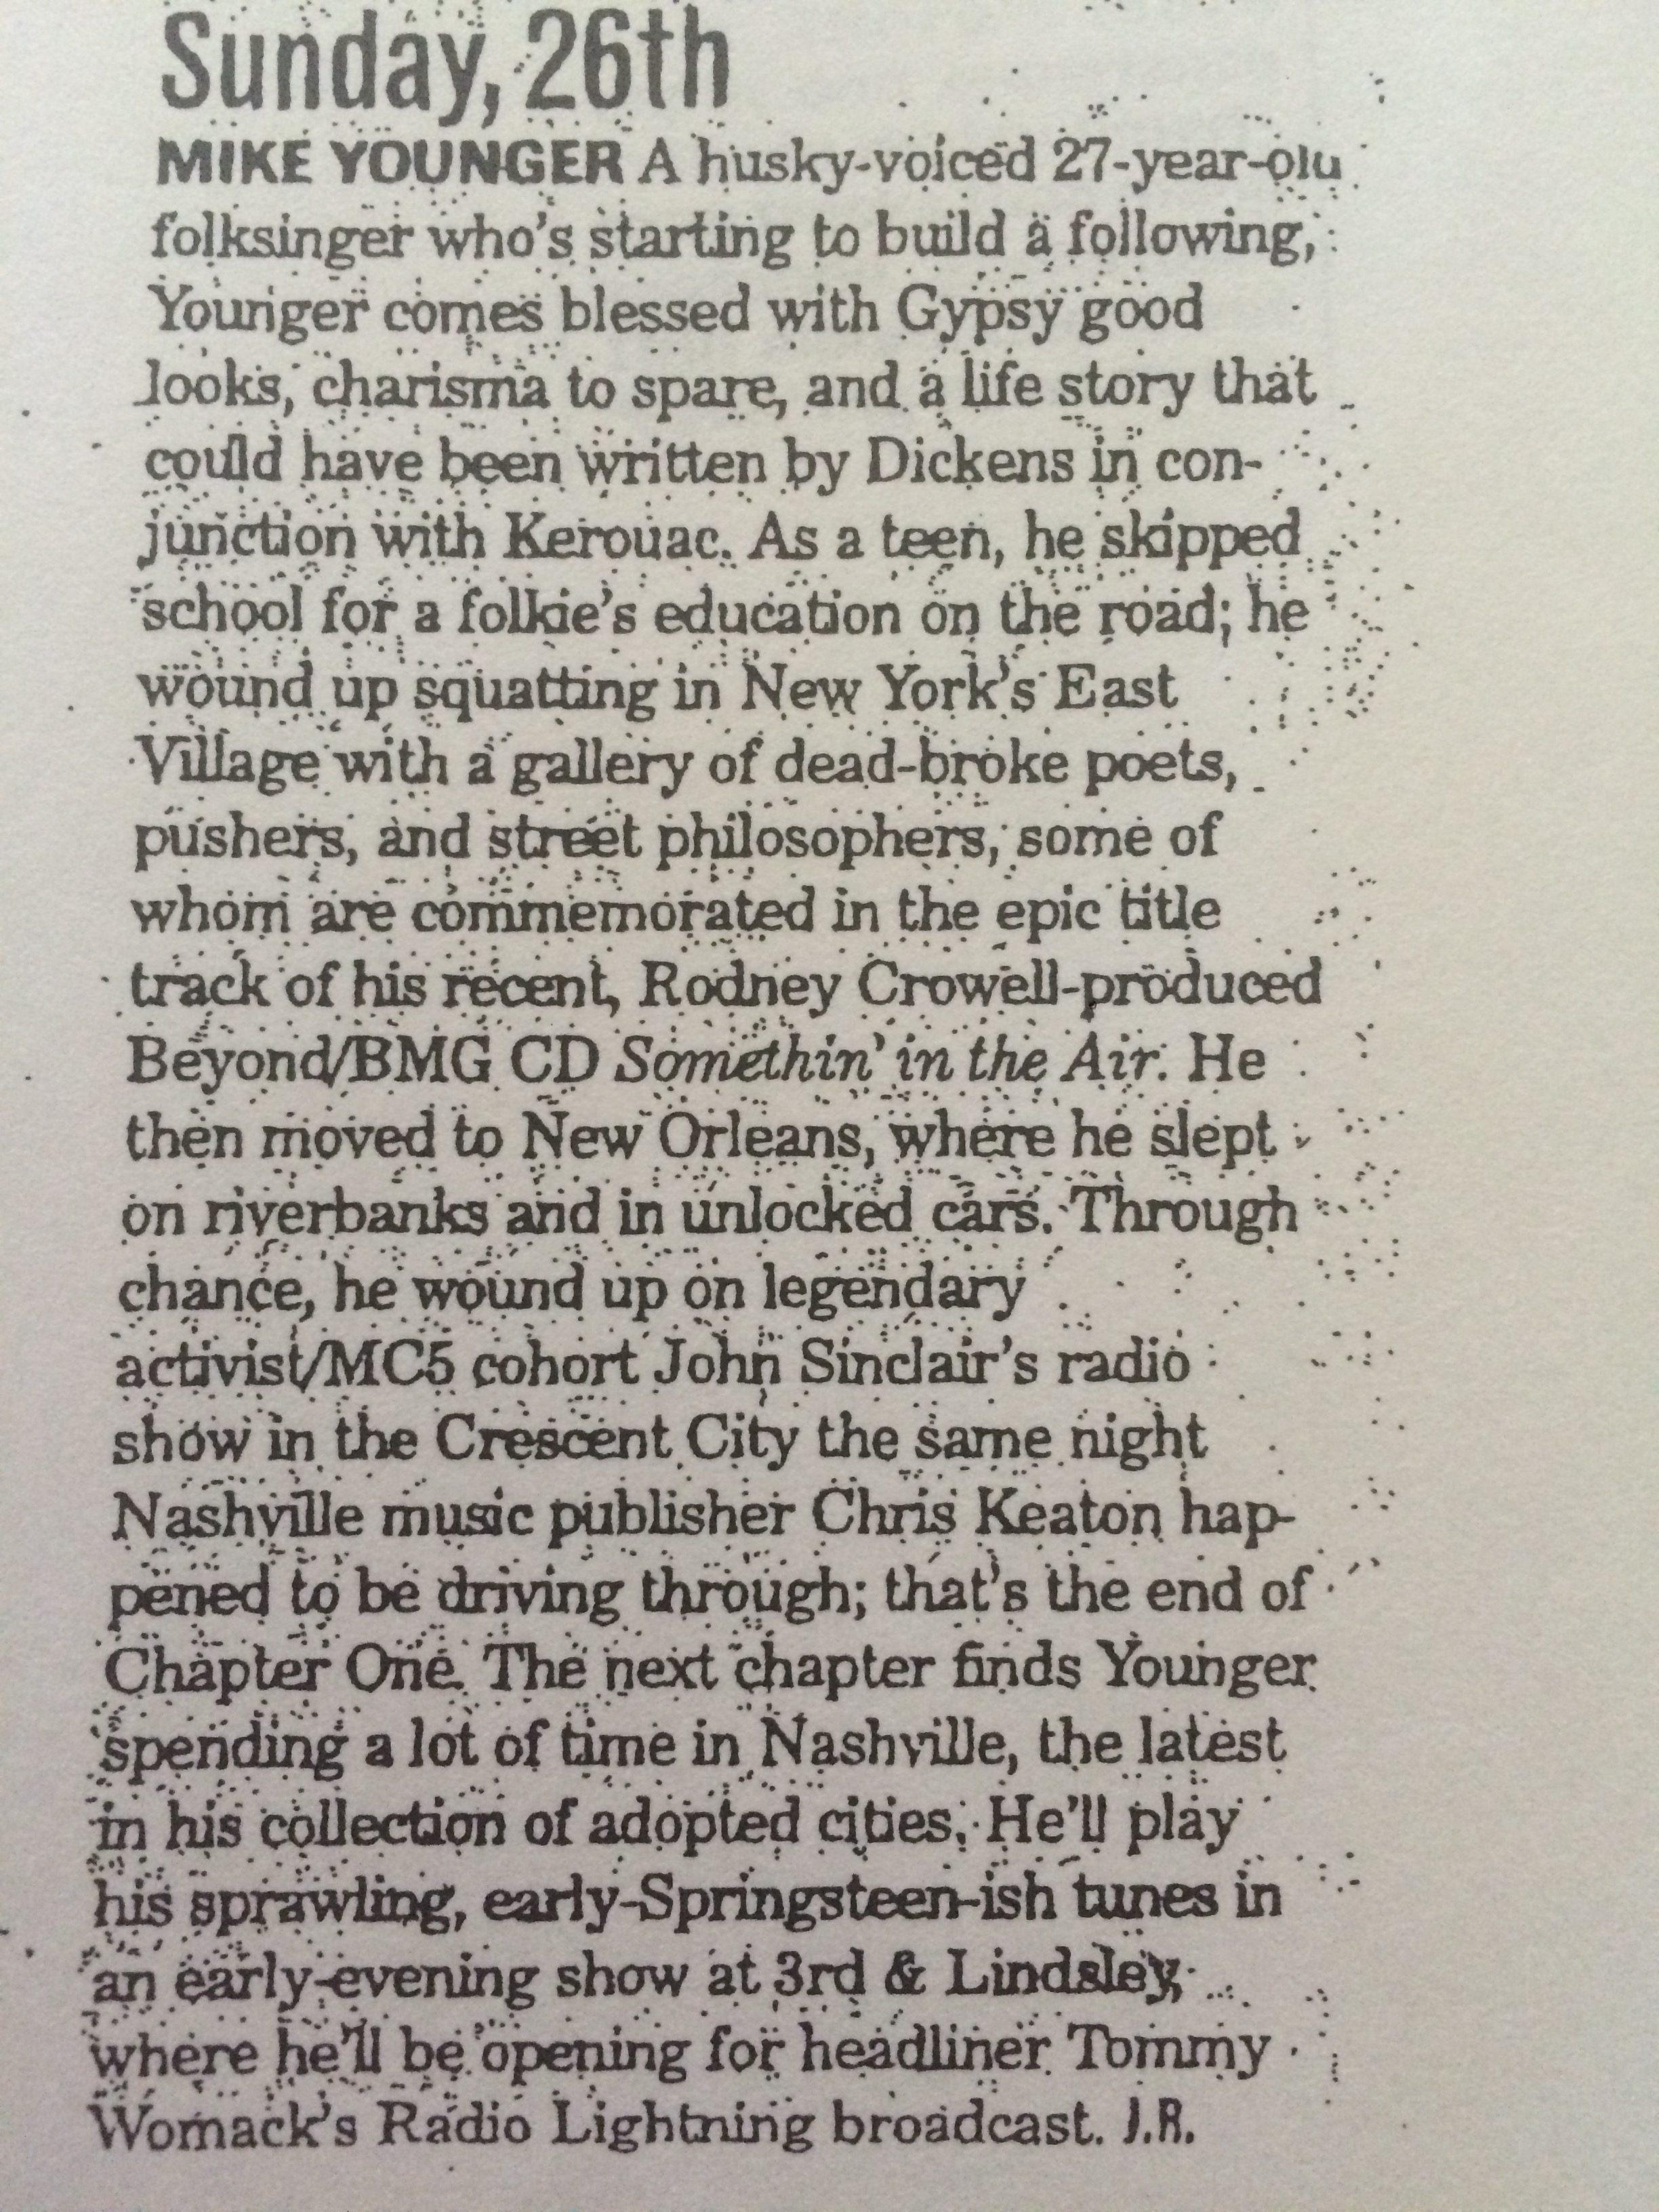 The Nashville Scene 2000 review